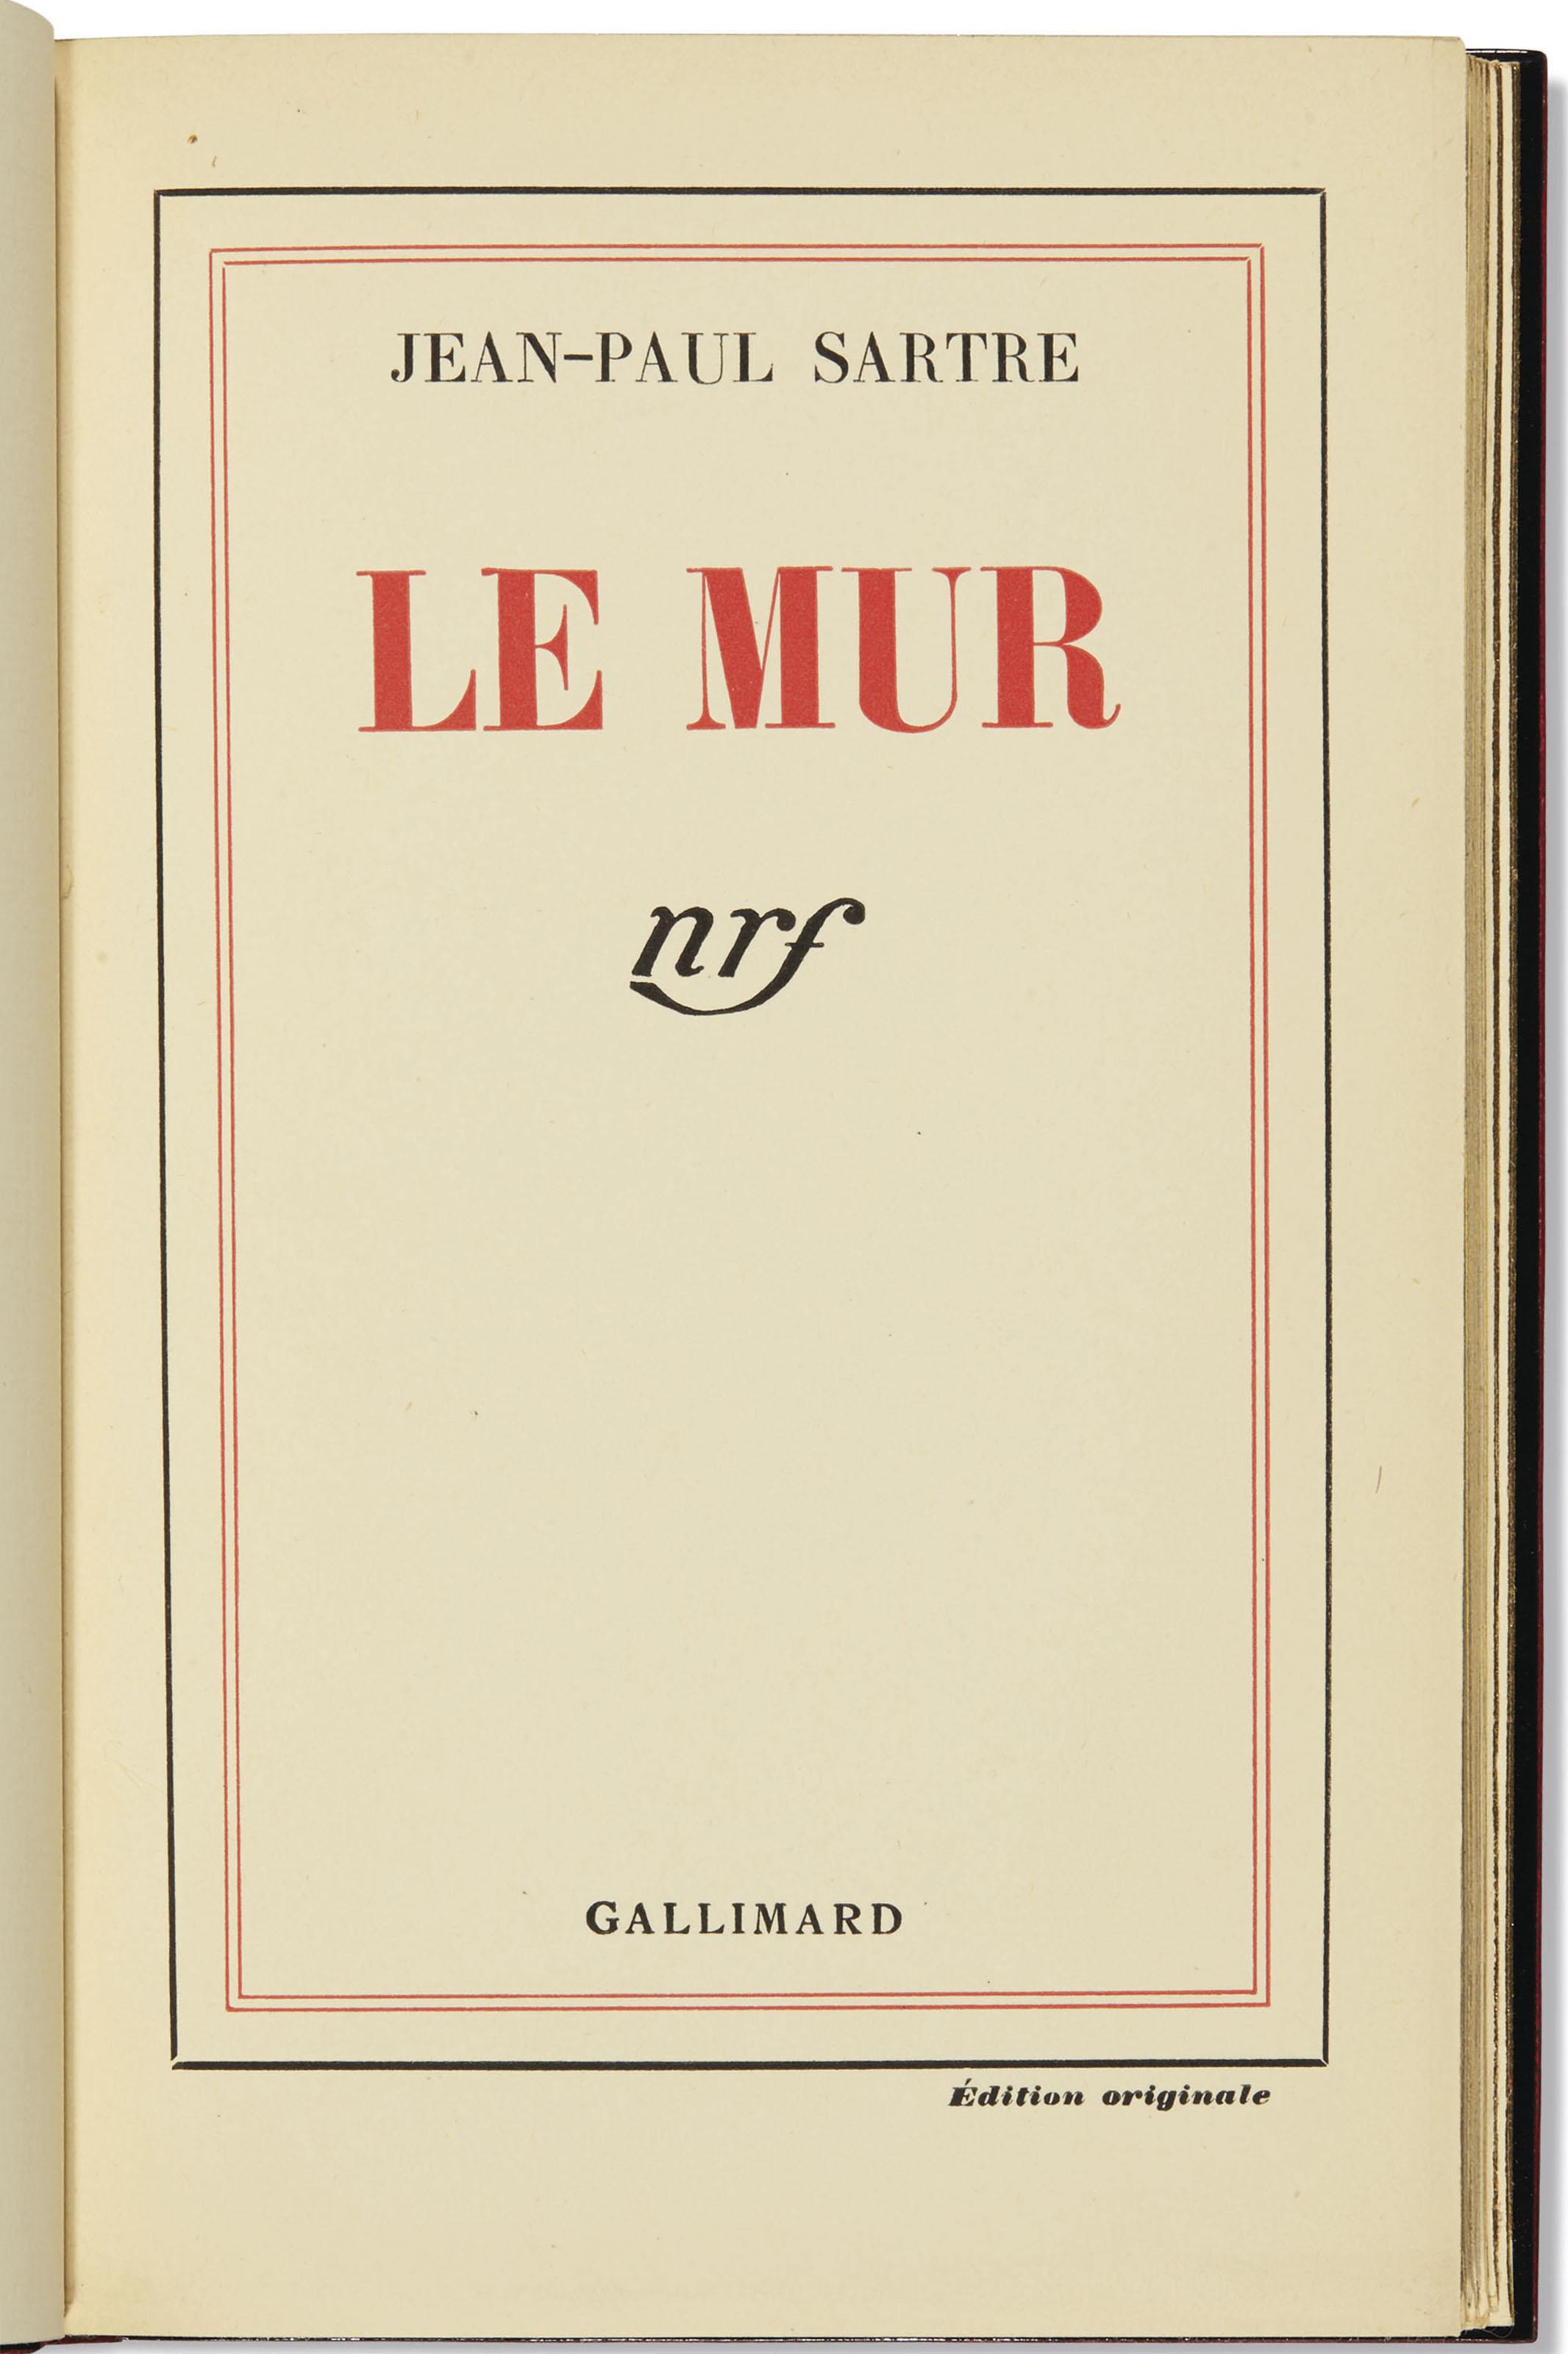 SARTRE, Jean-Paul (1905-1980)